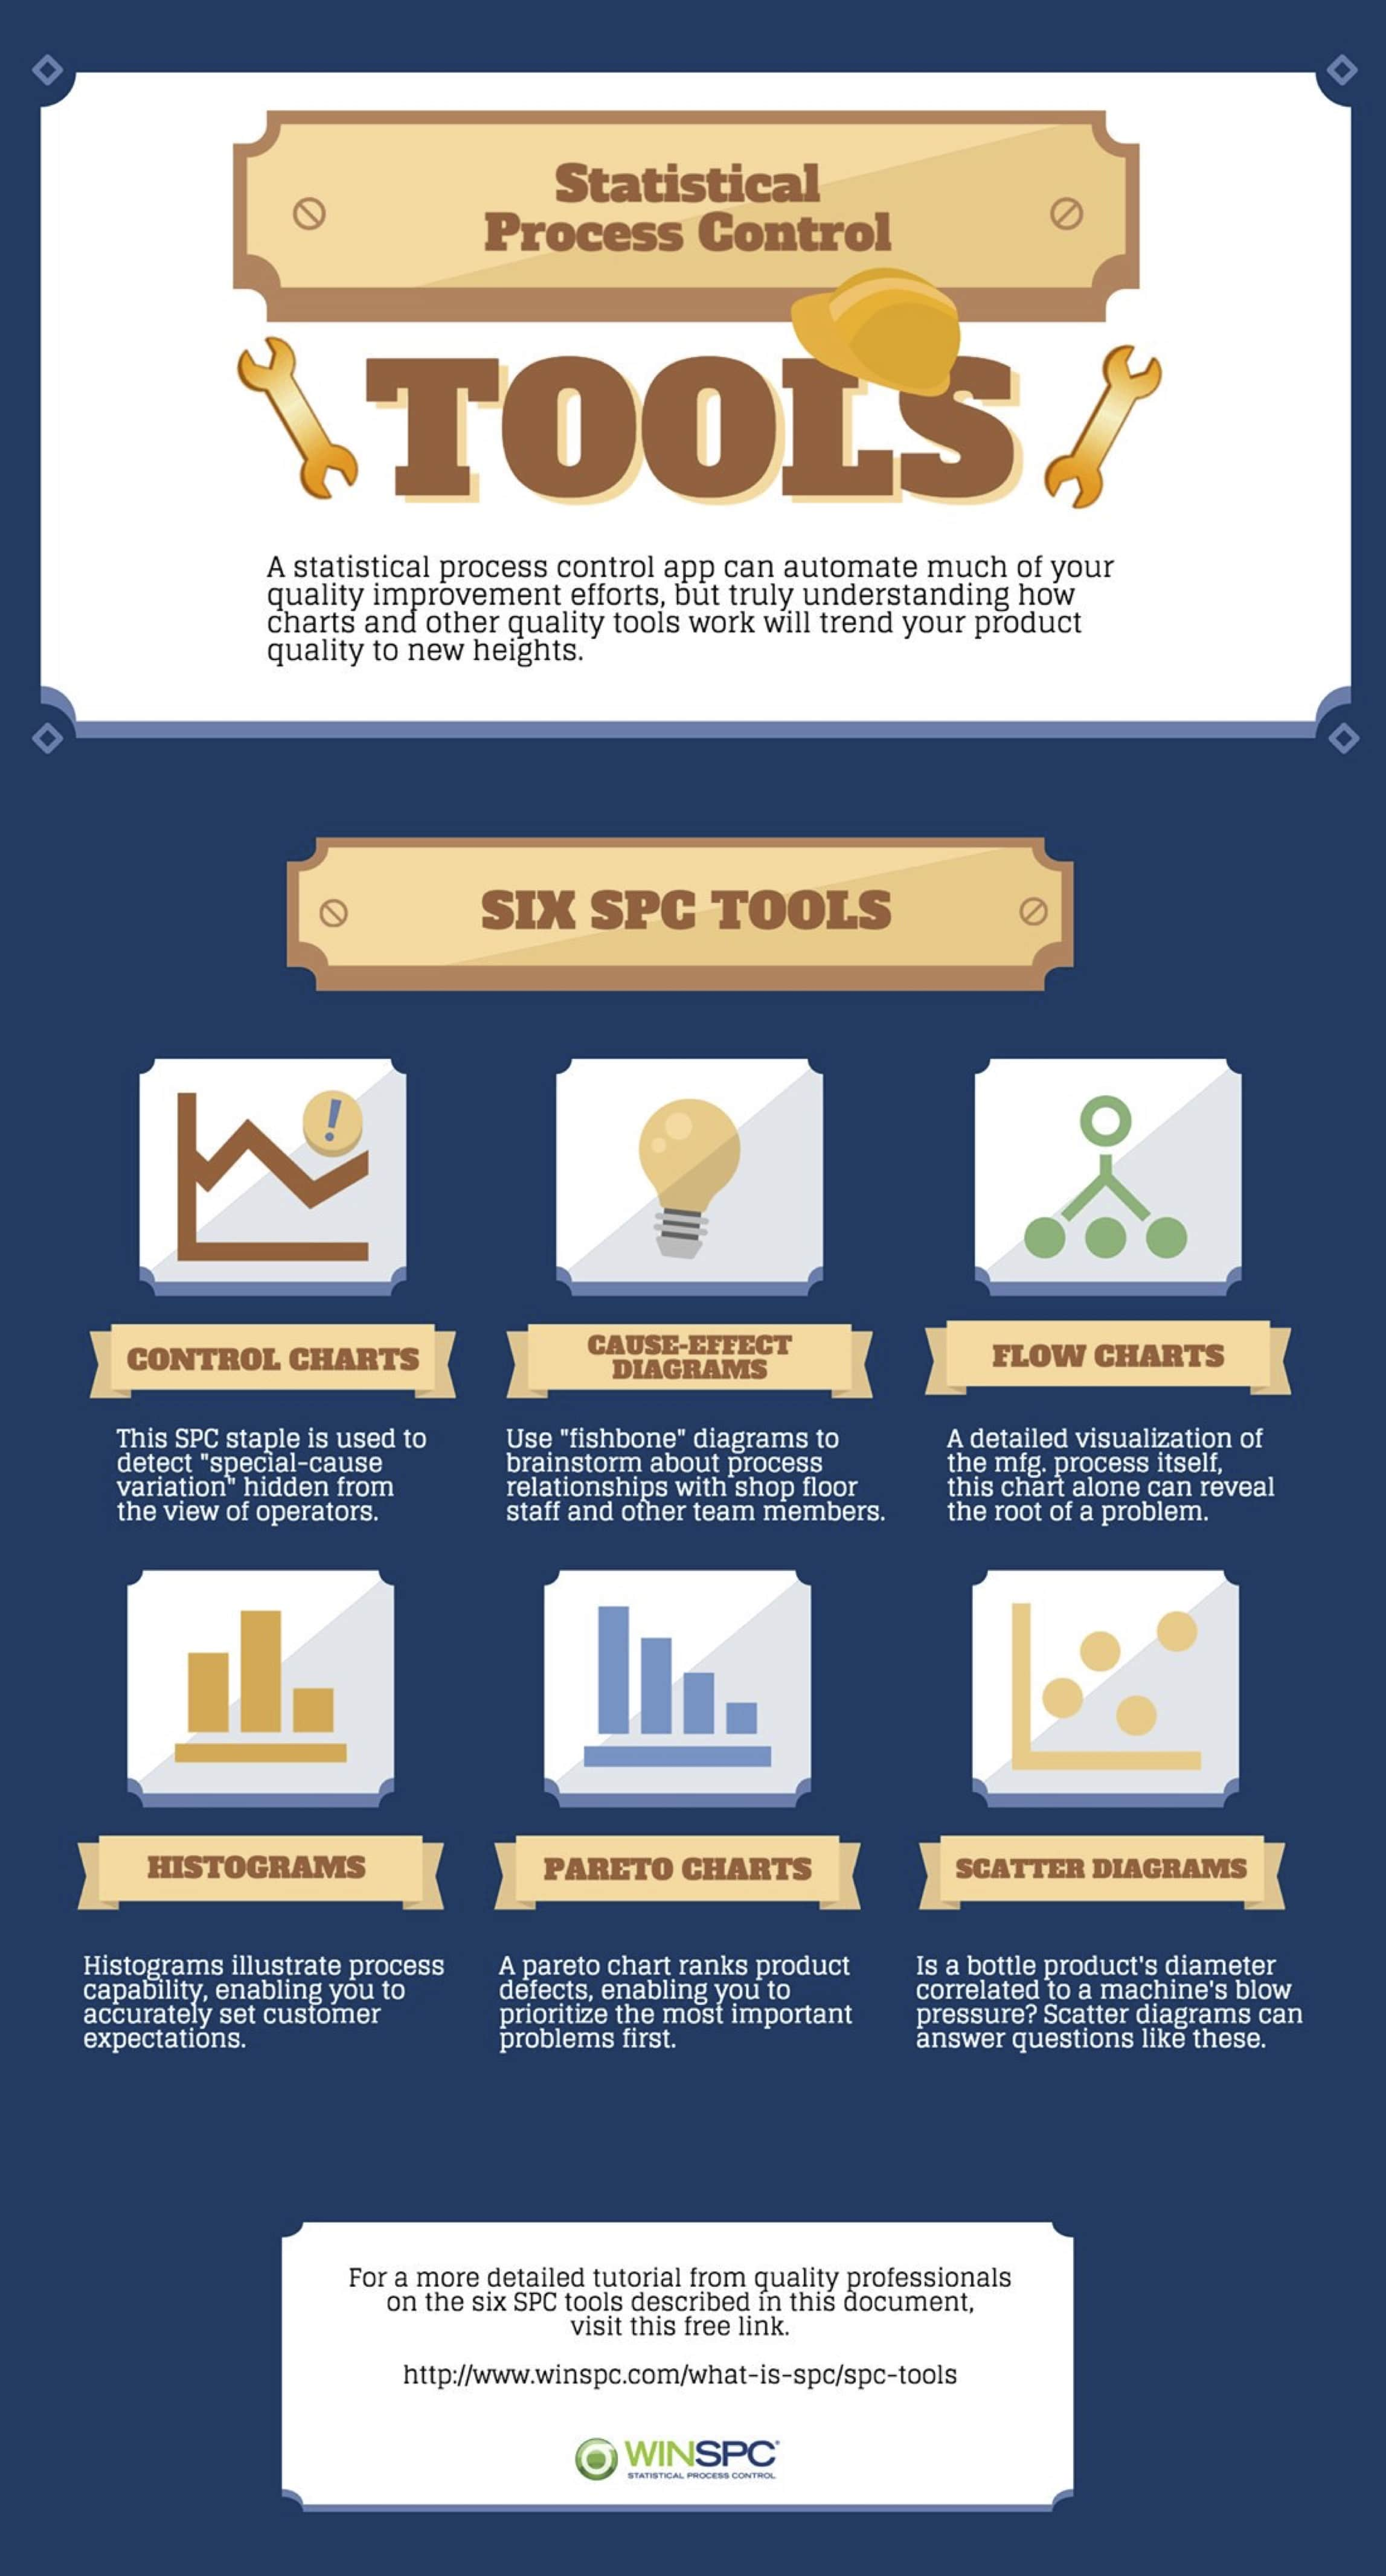 SPC Tools for Manufacturing Quality Improvement | WinSPC com